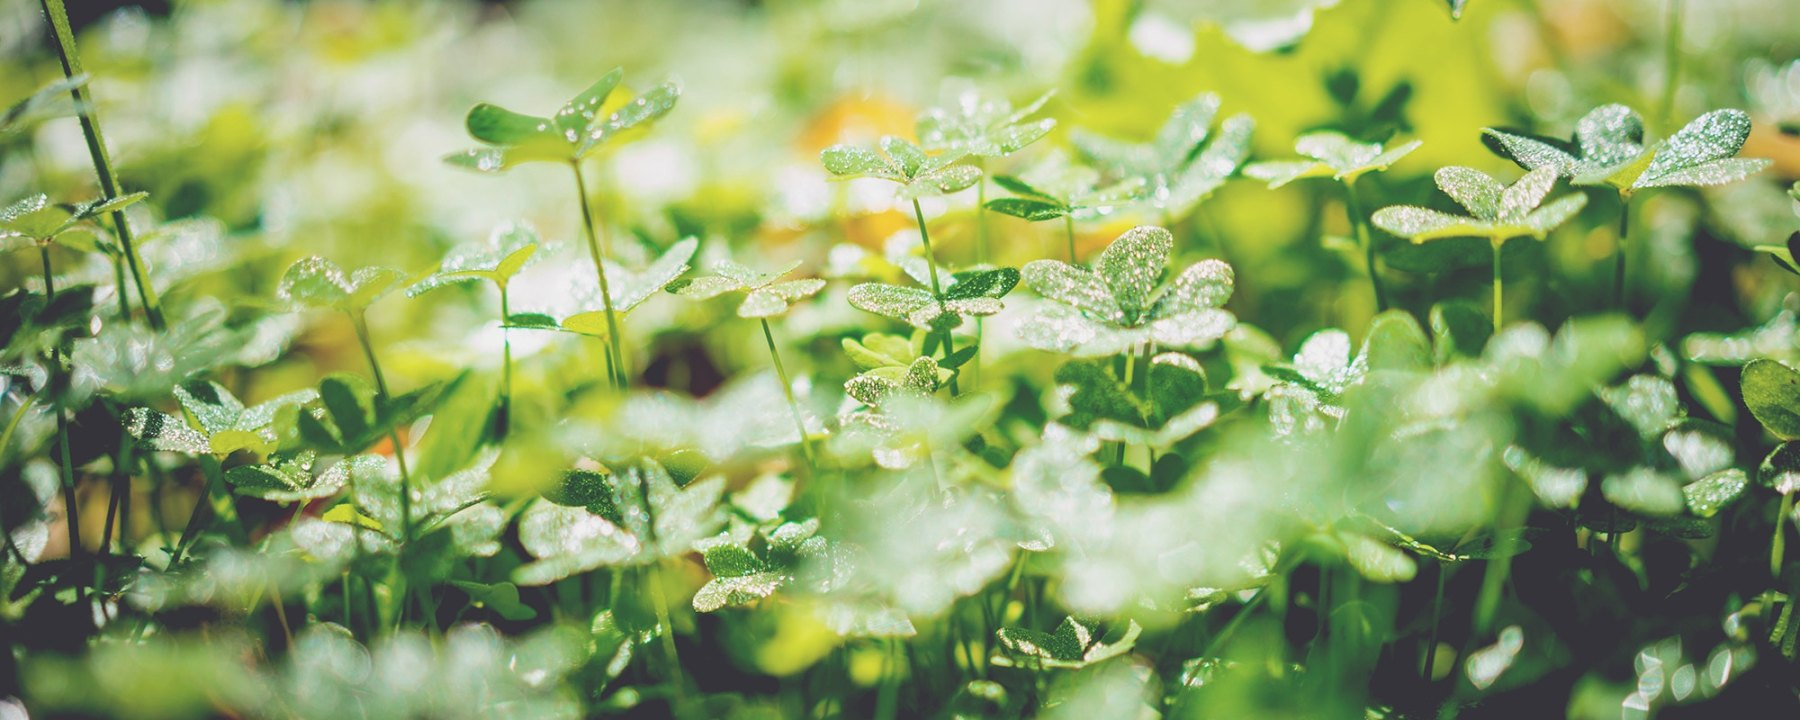 Shamrocks, Saint Patrick, beauty, spring, Irish